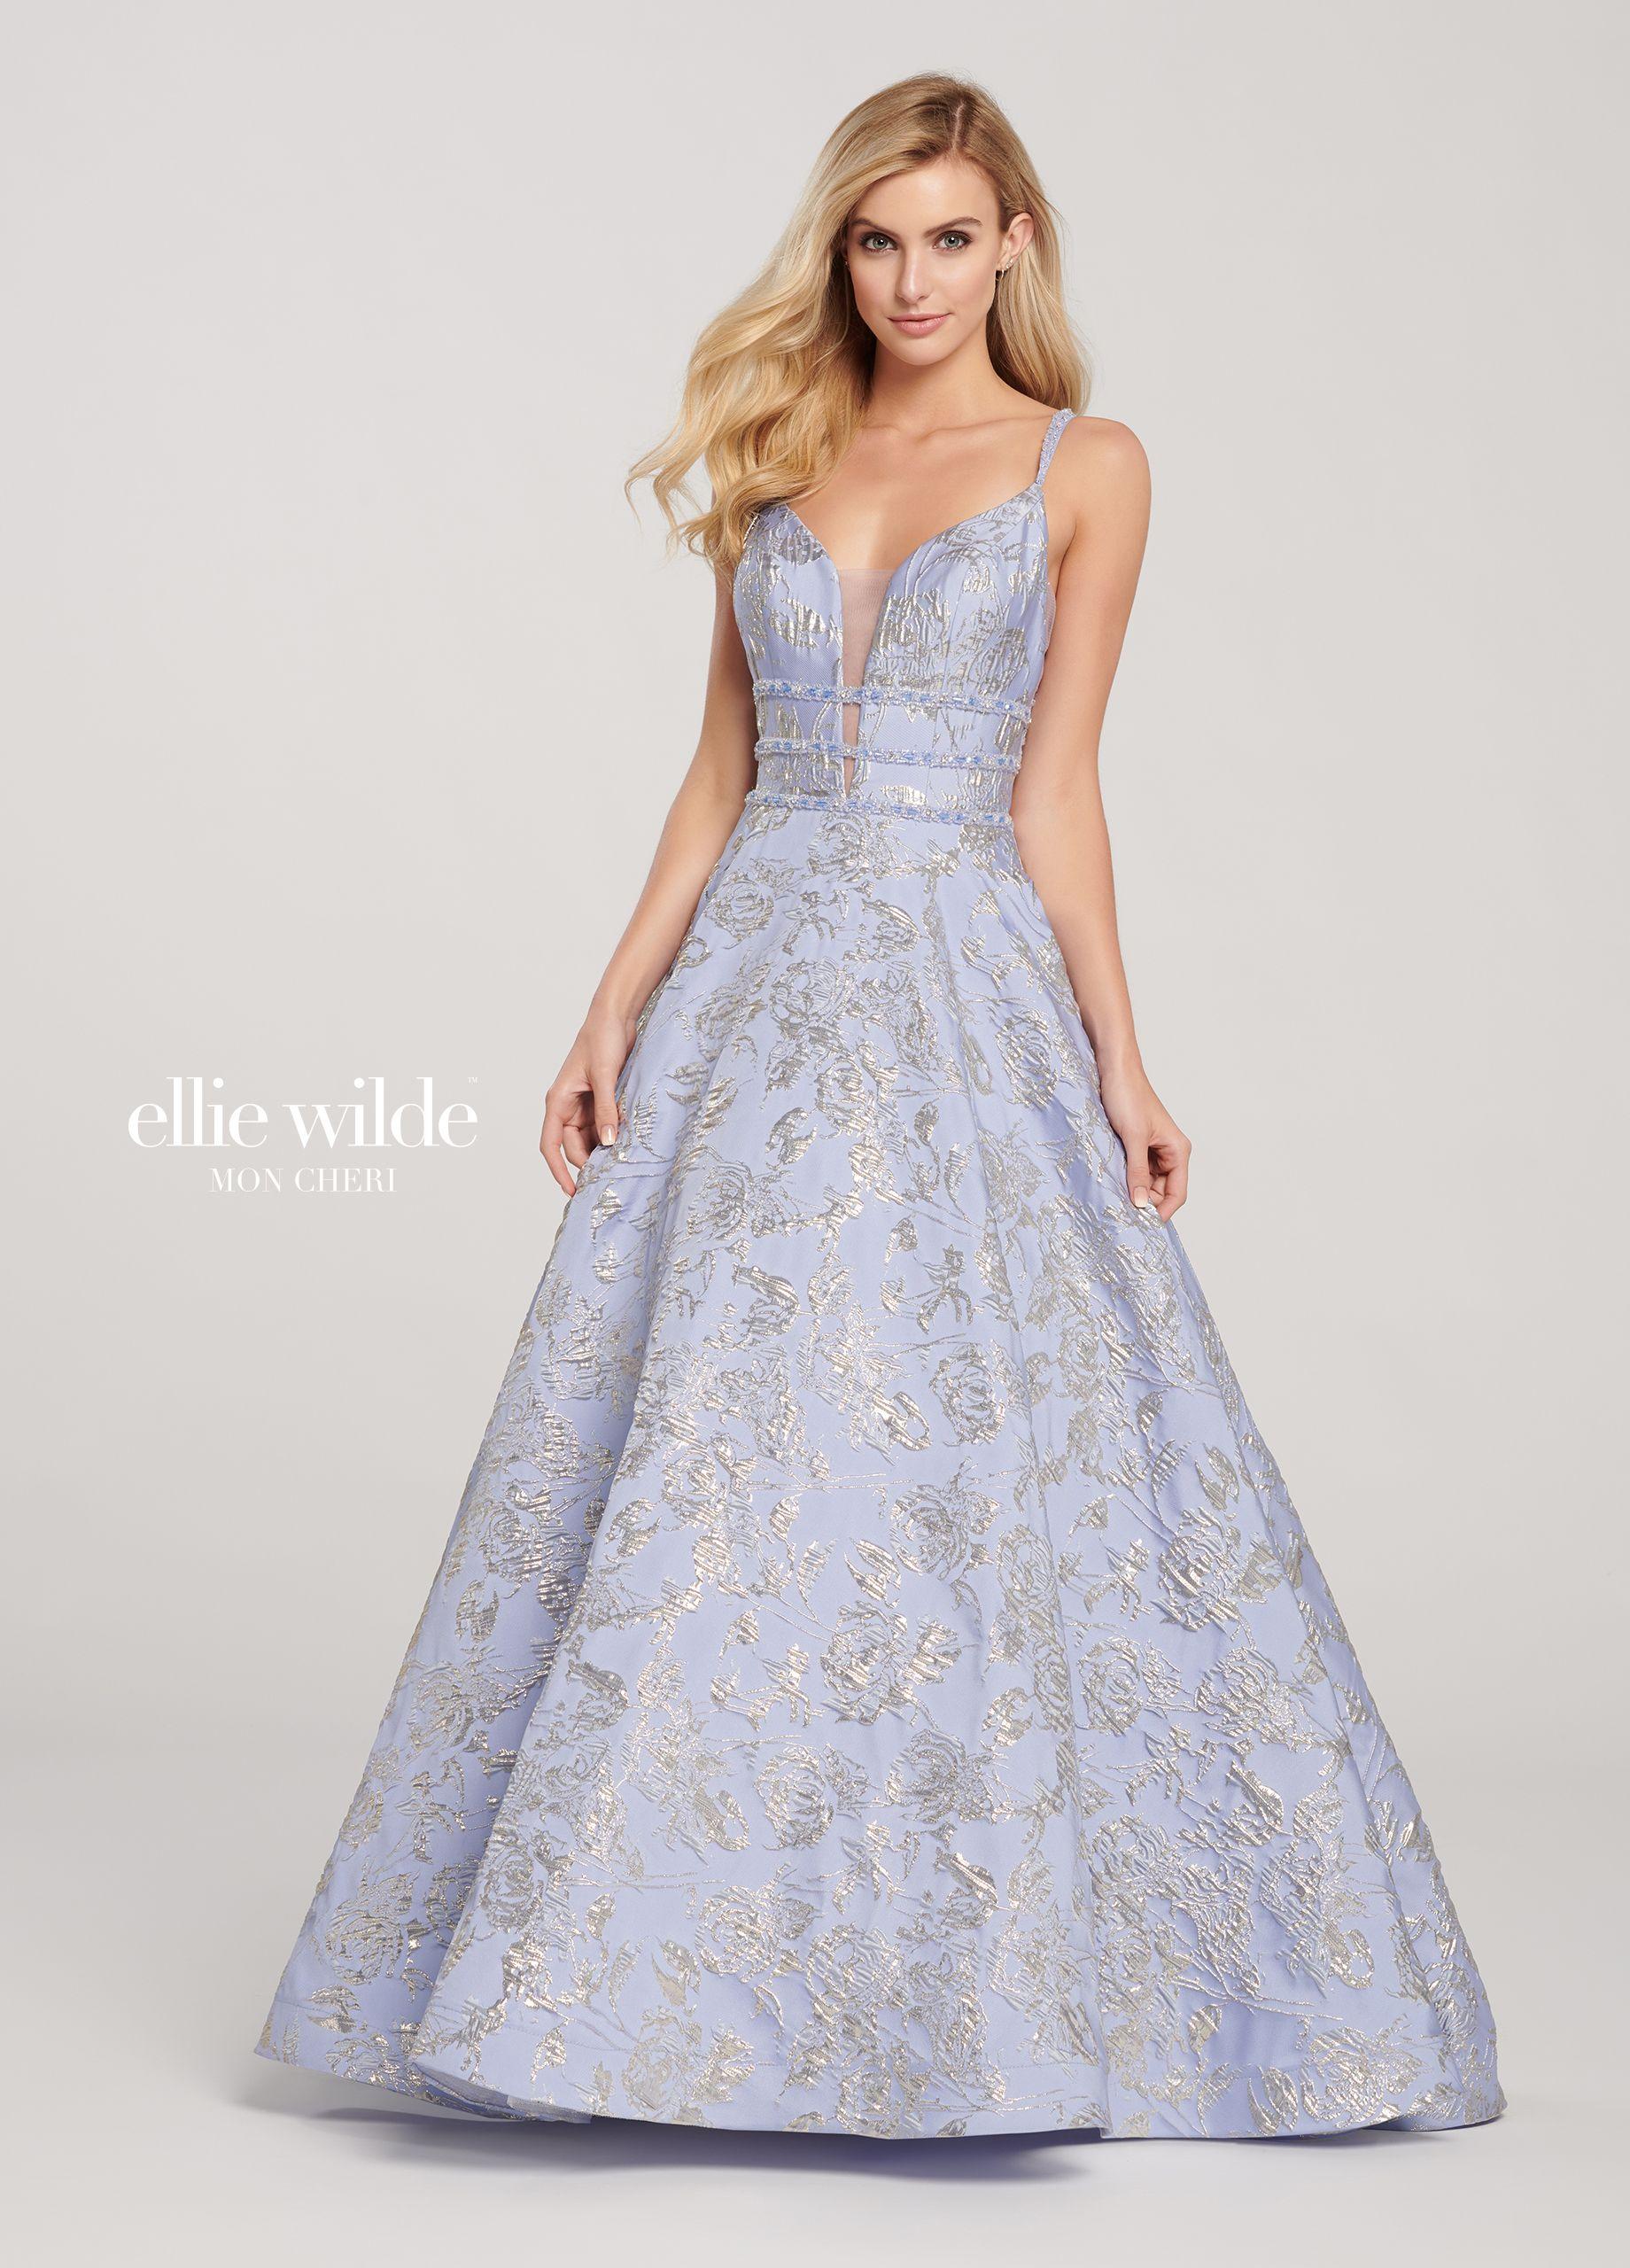 33+ Ellie wilde prom dresses ideas in 2021